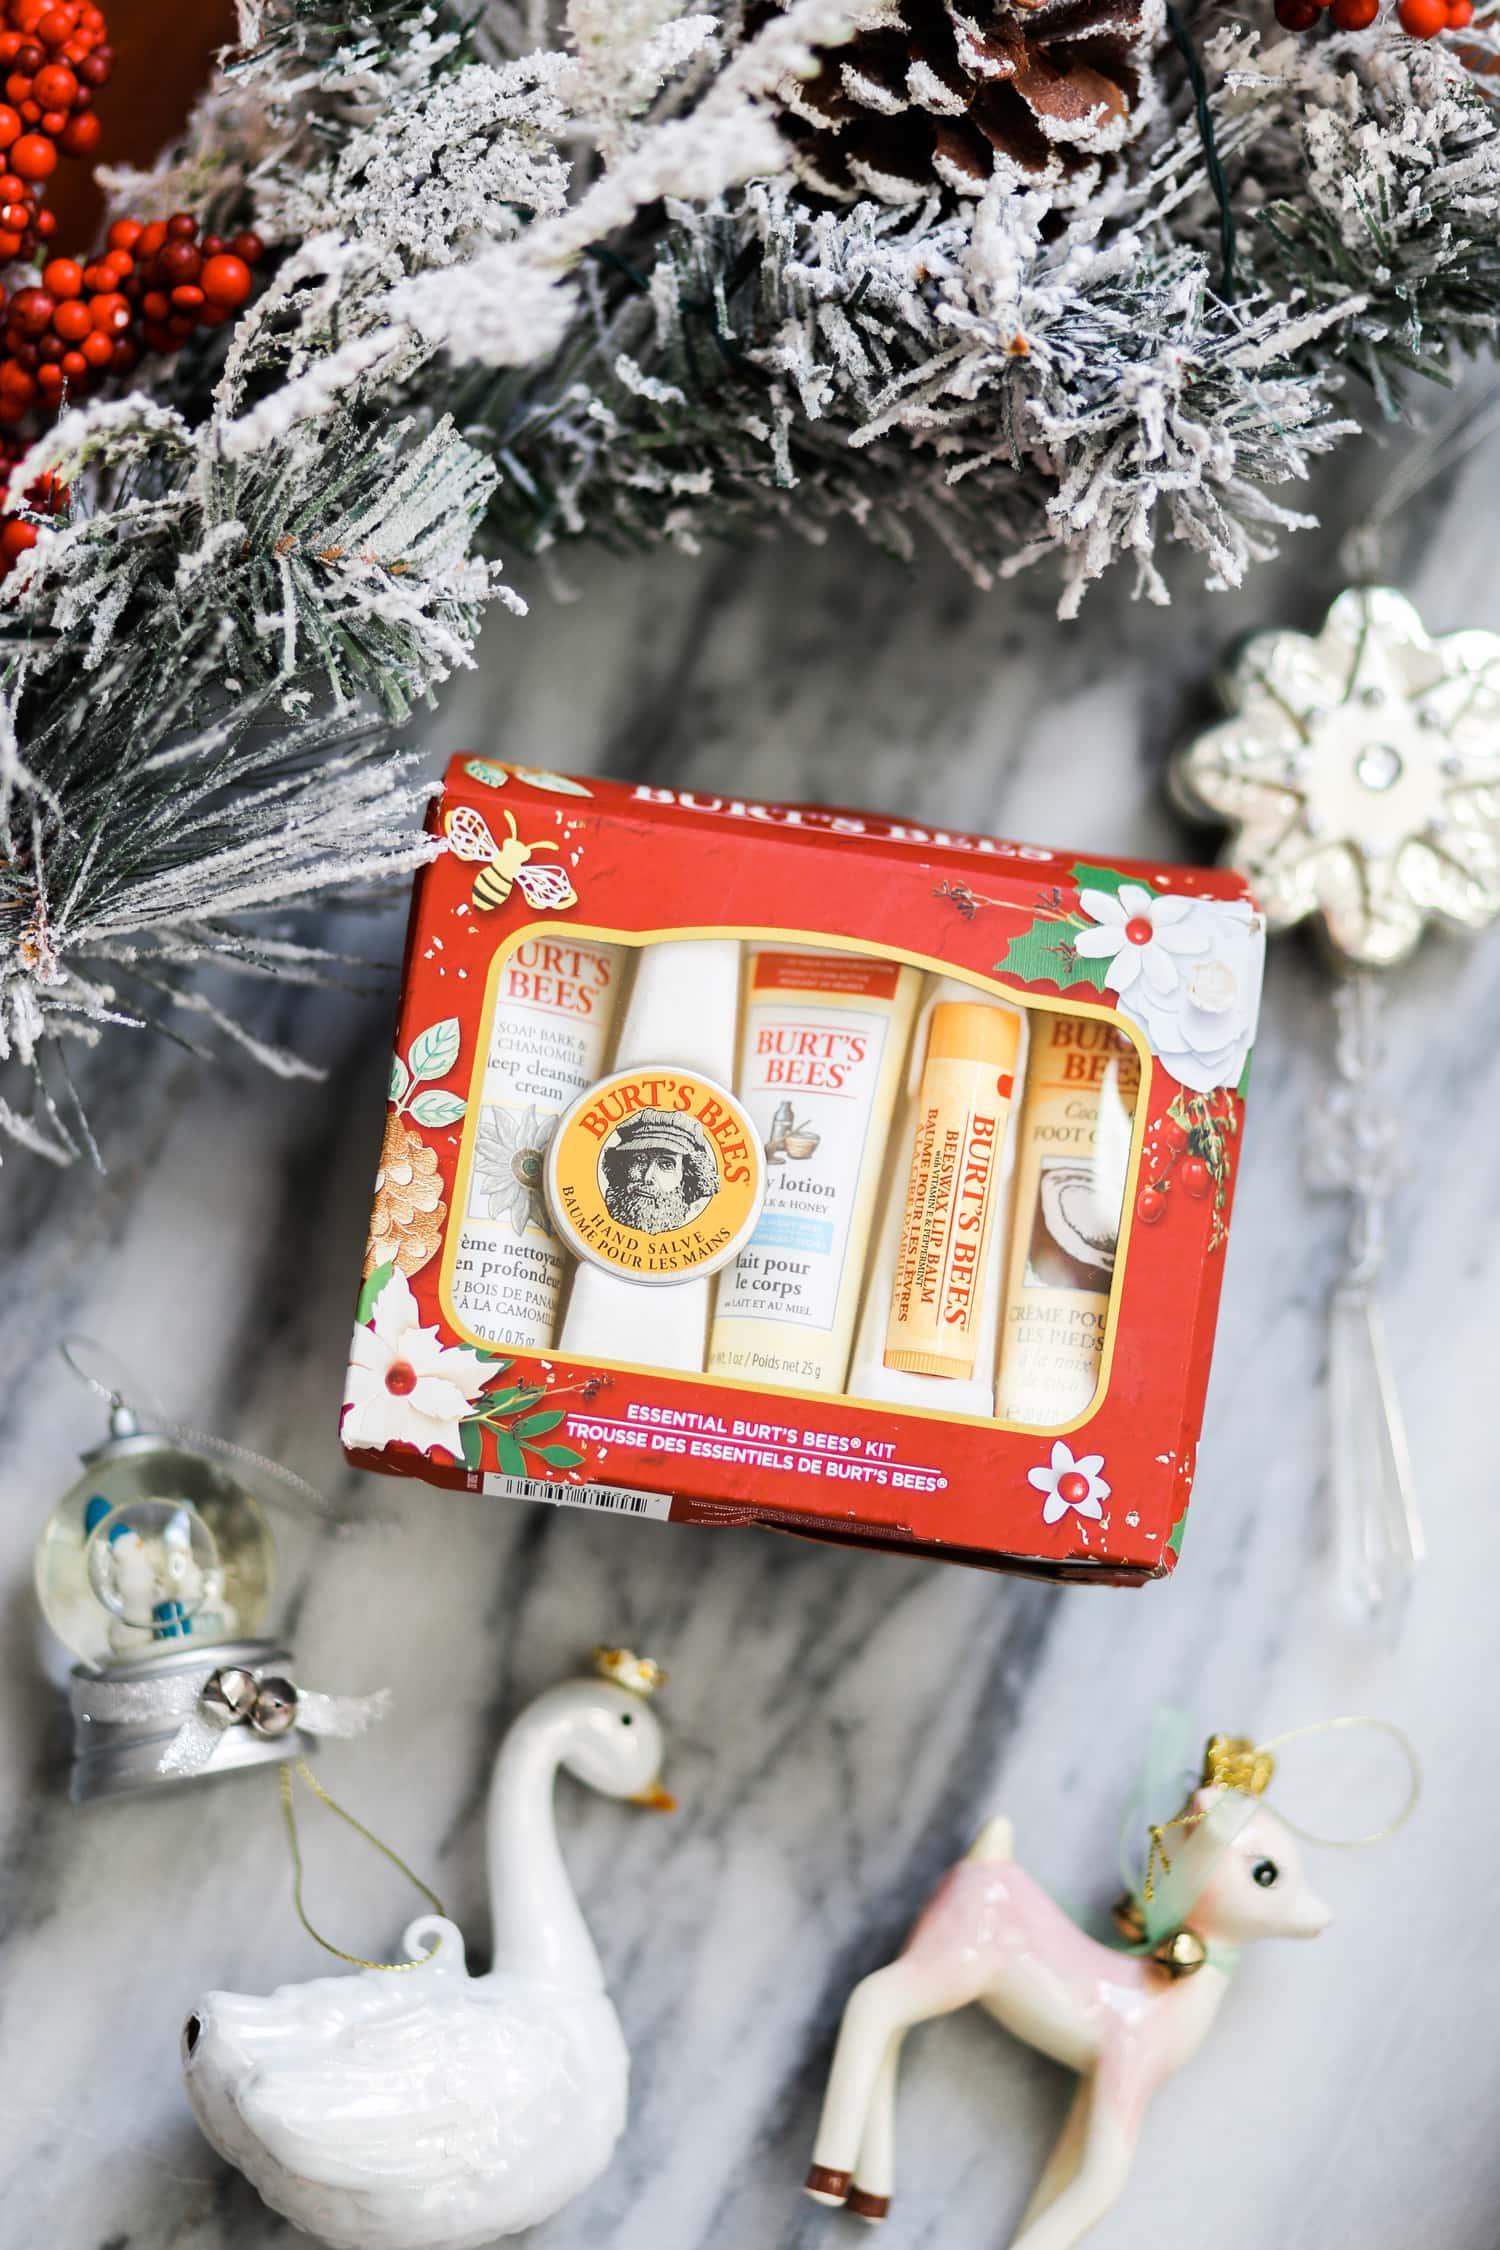 Burt's Bees Christmas gift ideas Christmas tree